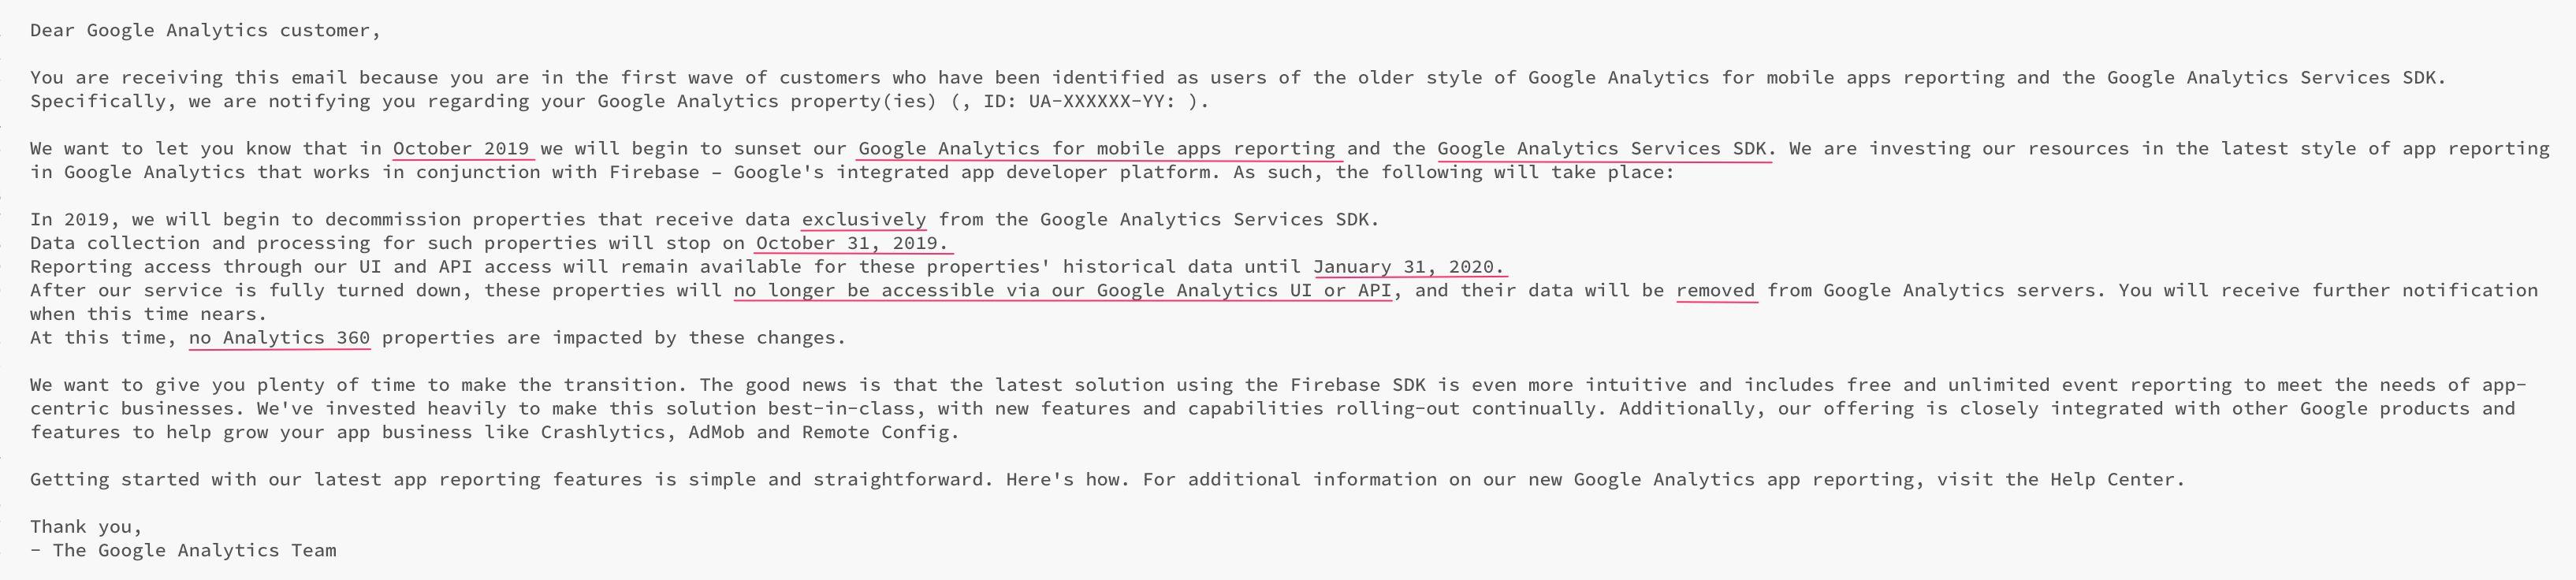 Google Analytics For Mobile Apps Getting Shut Down | Simo